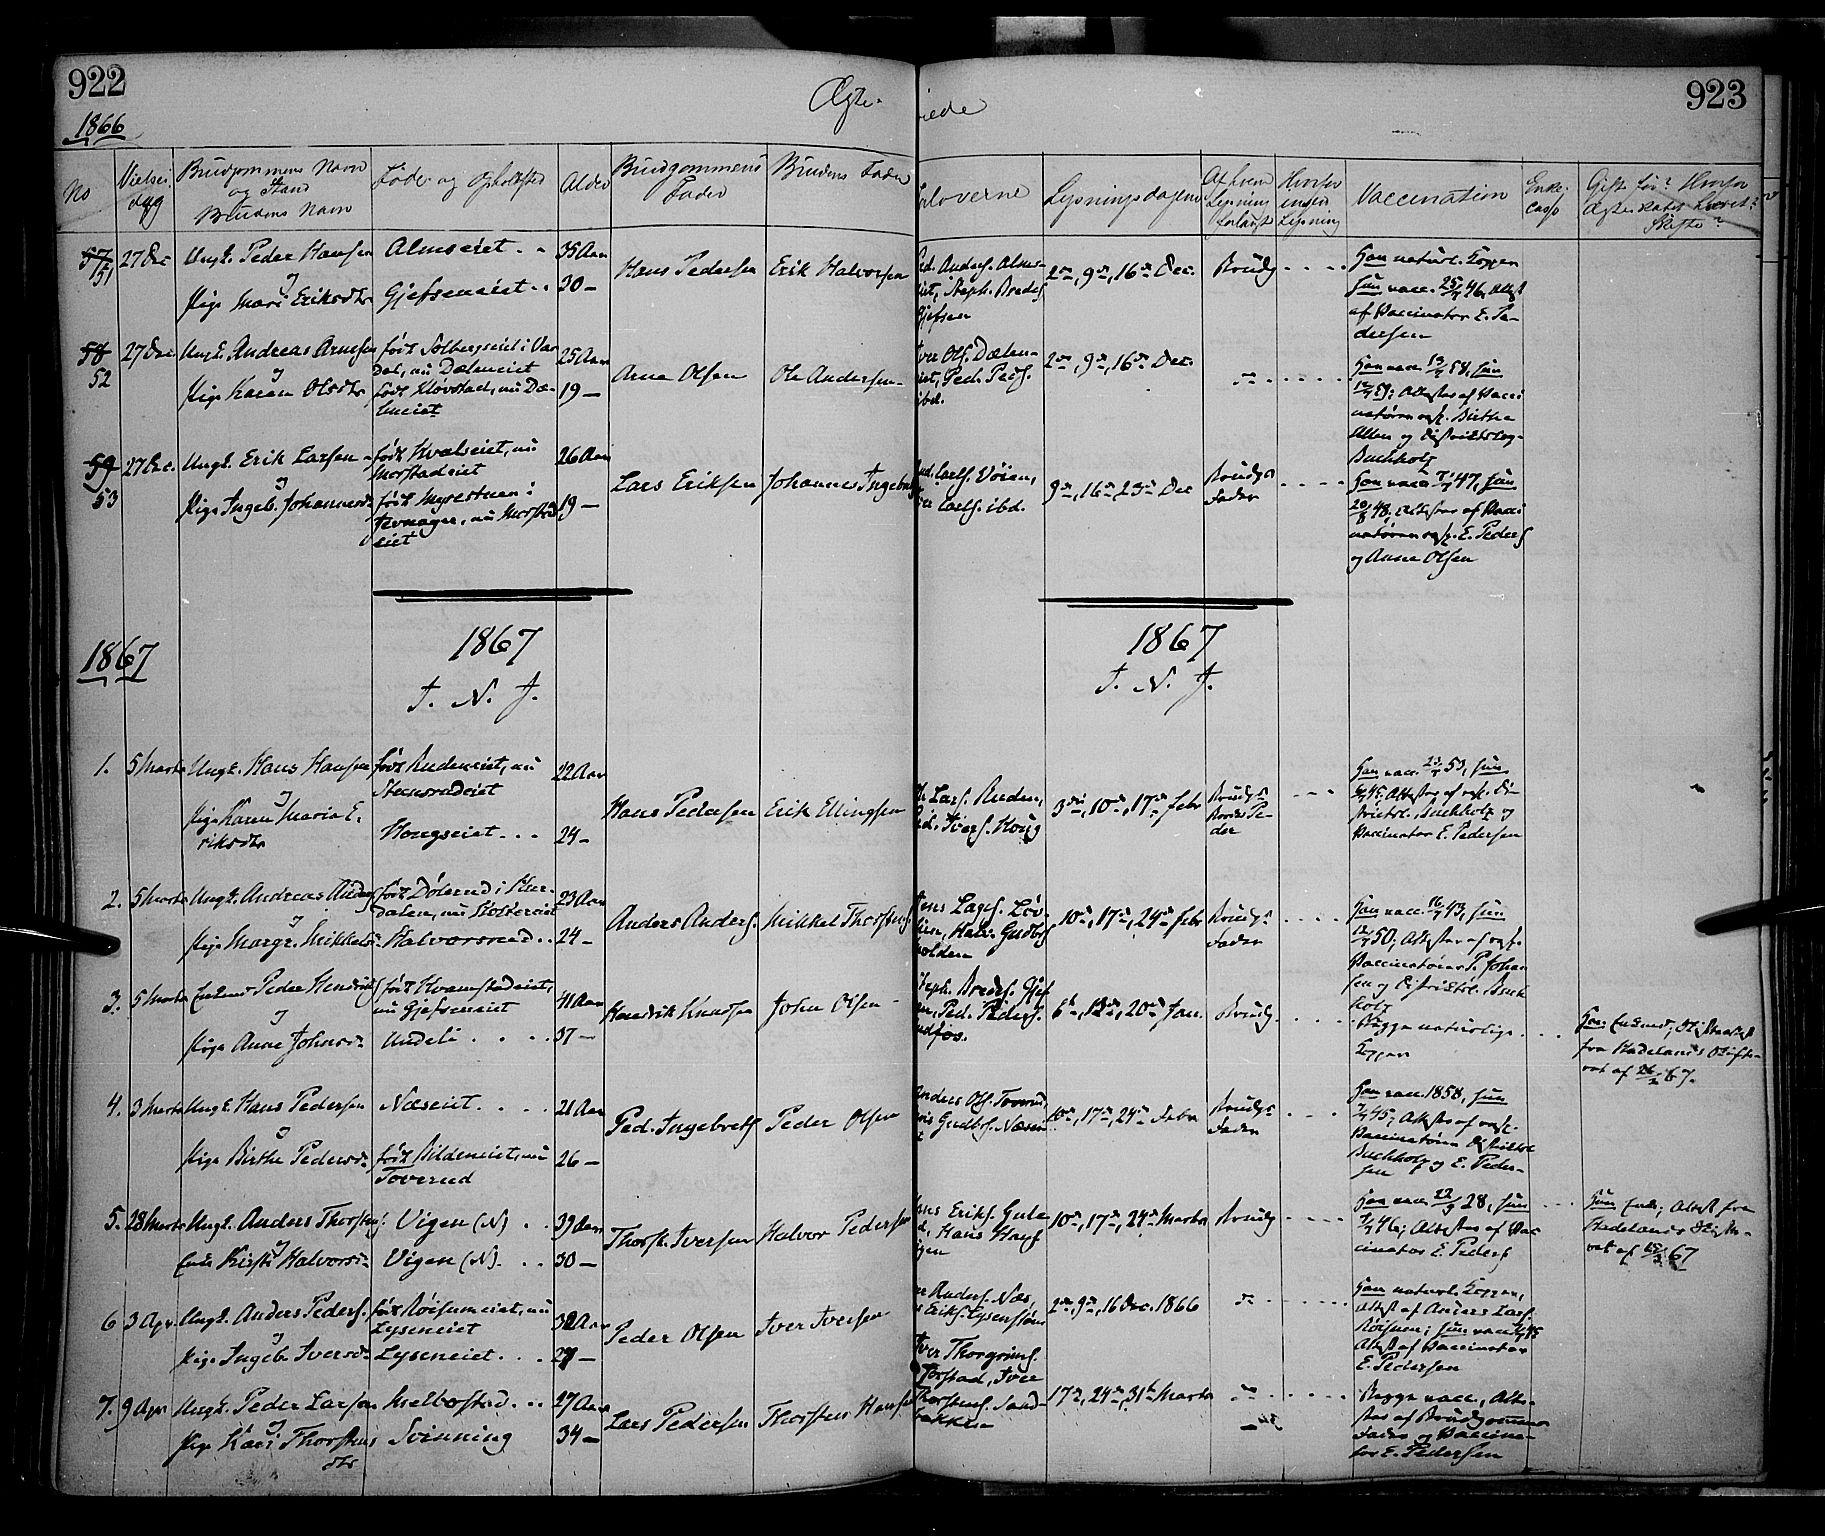 SAH, Gran prestekontor, Ministerialbok nr. 12, 1856-1874, s. 922-923